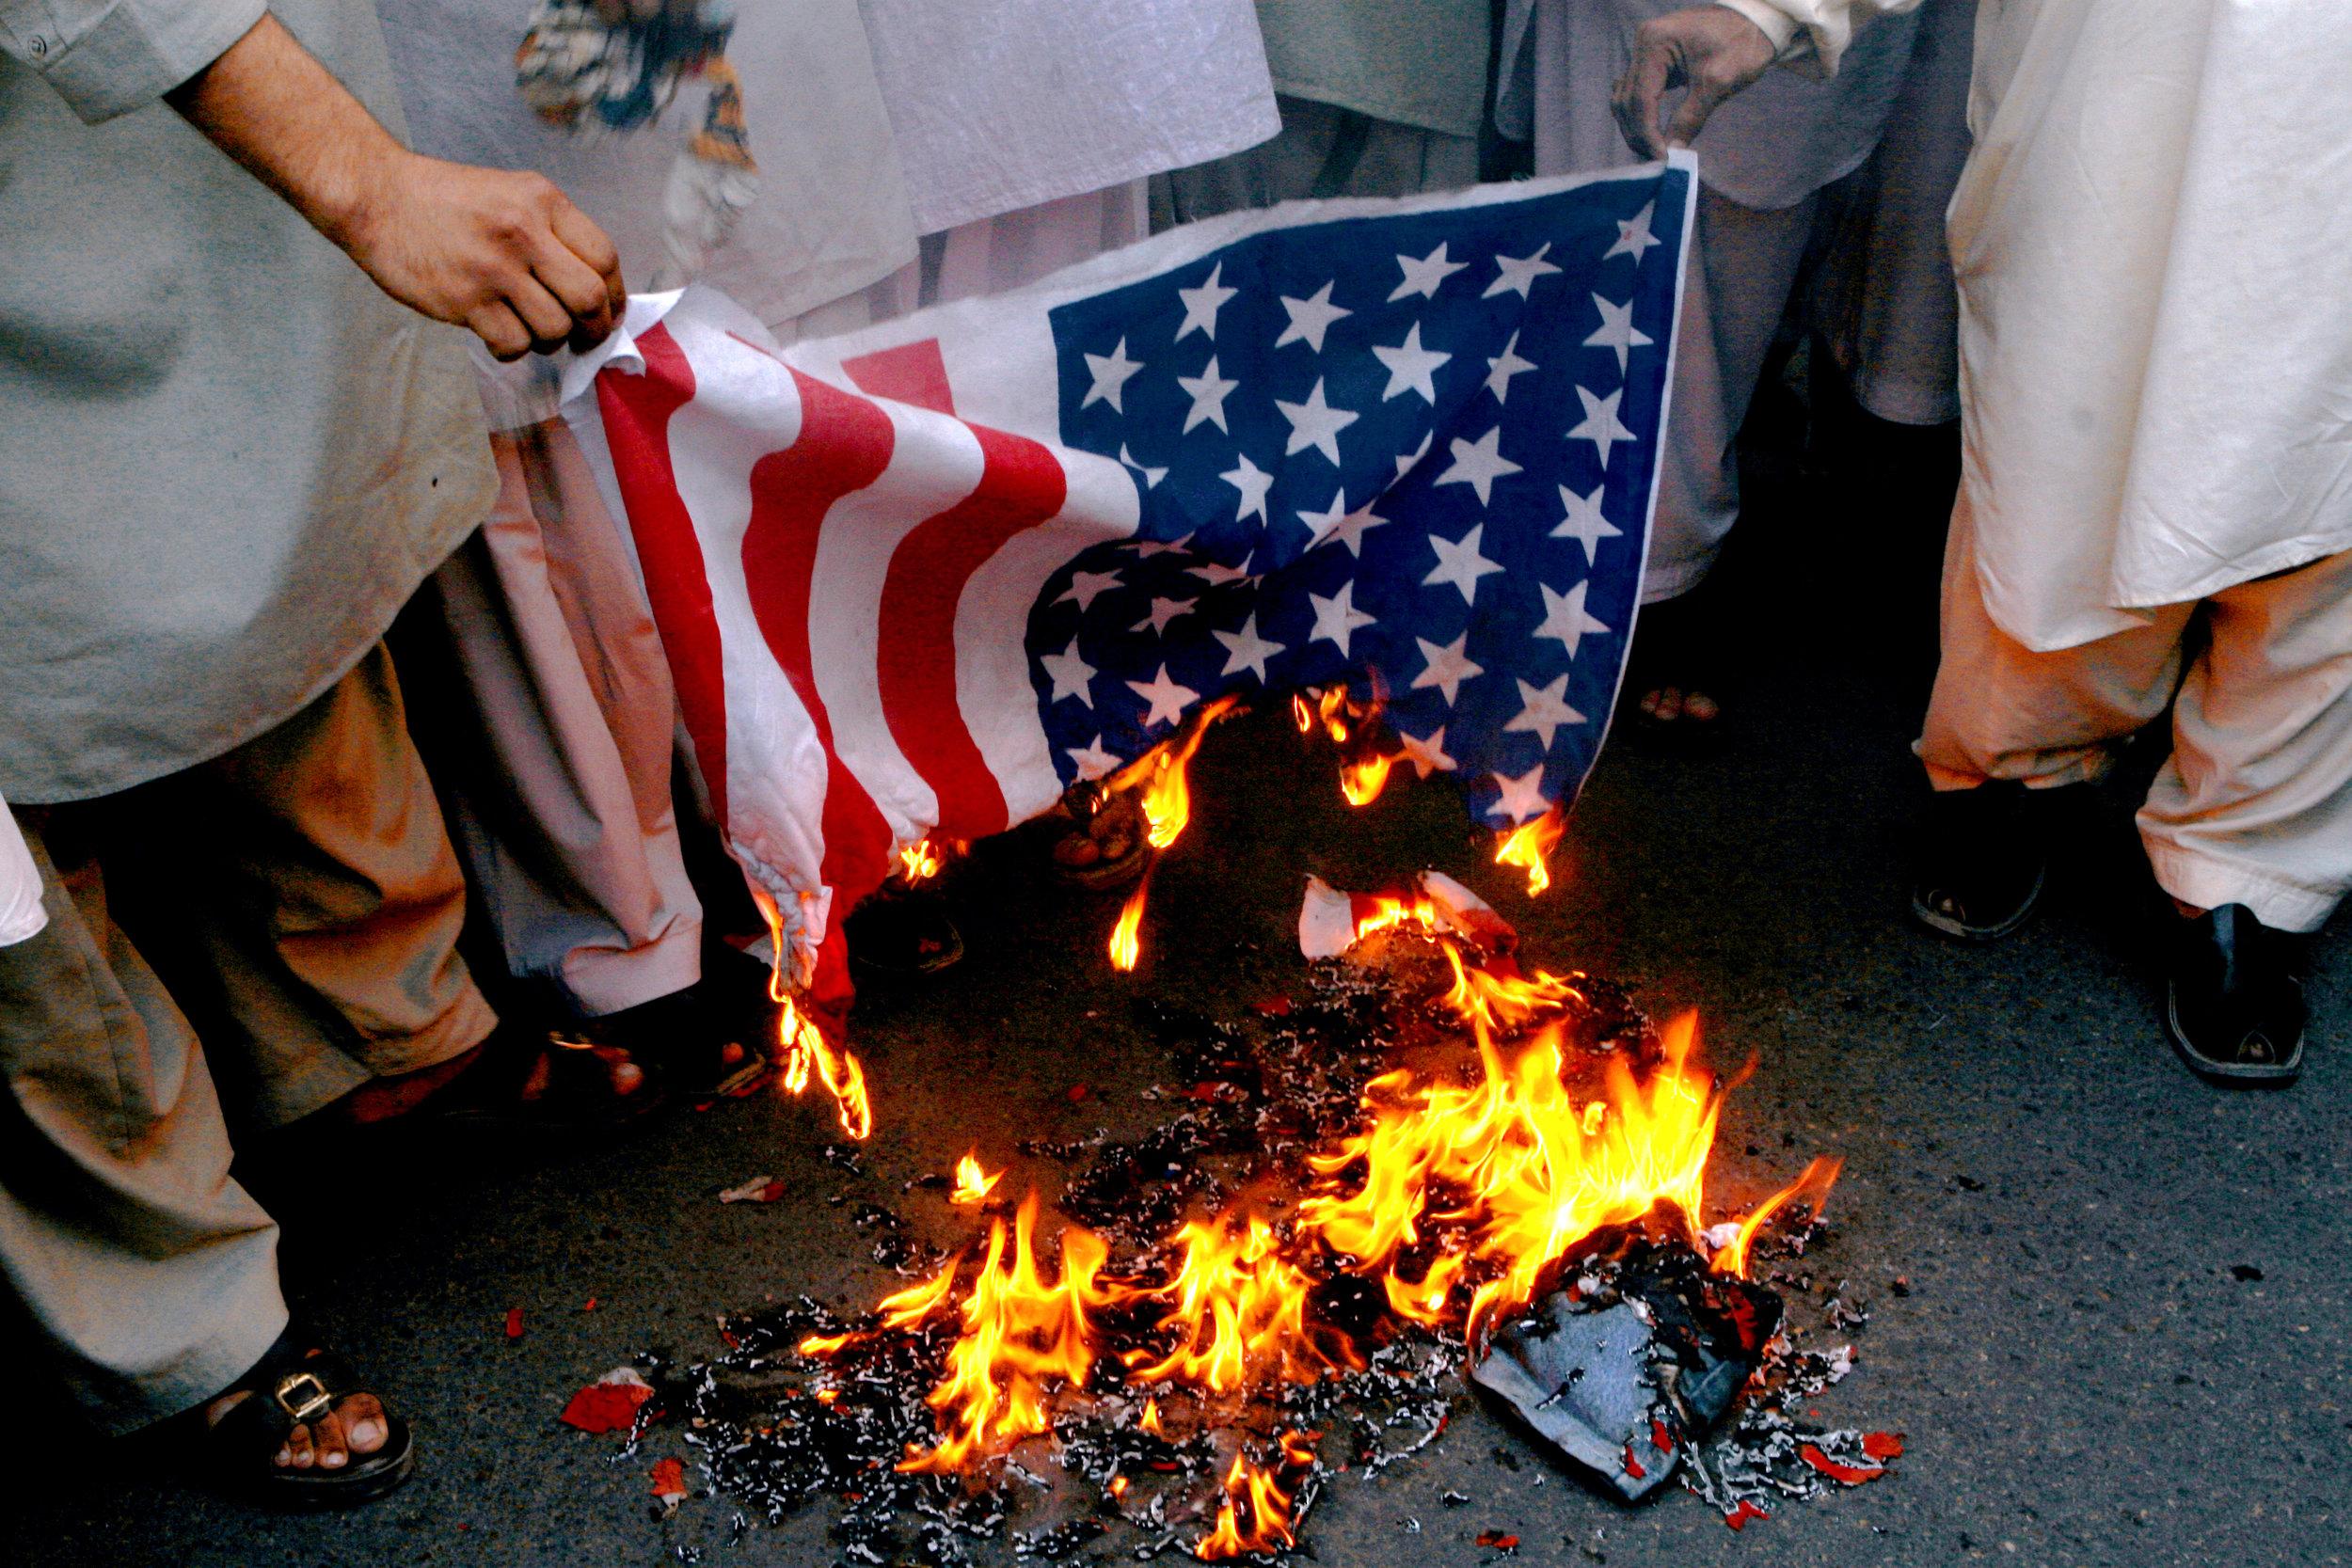 Image © Demonstrations in Karachi , Pakistan, 2008,Egill Bjarnason